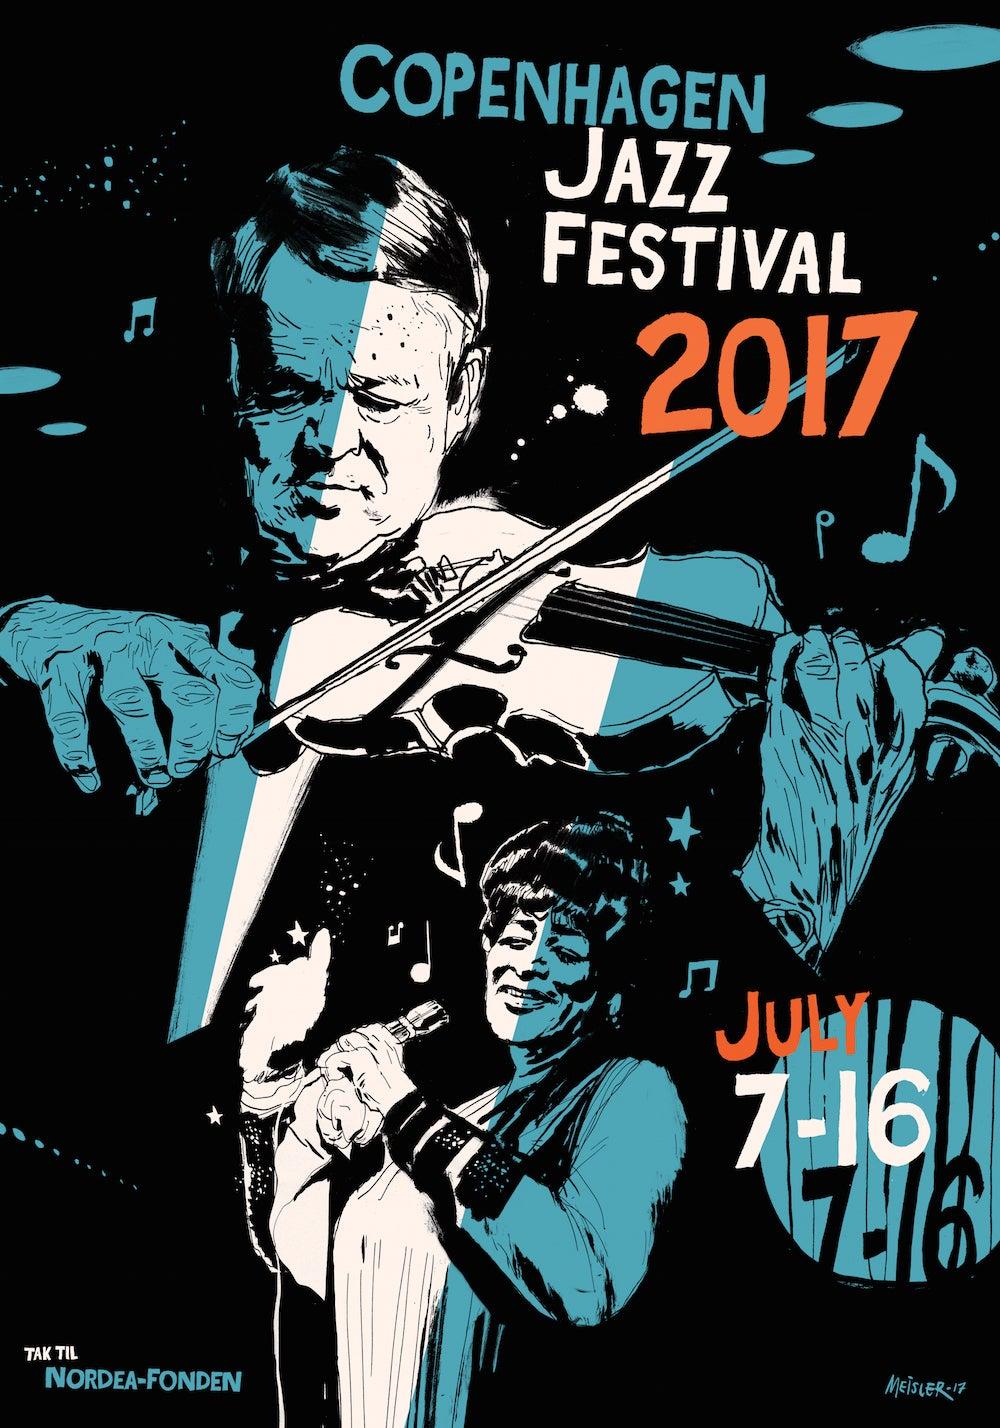 Montreux Jazz Festival 2015 >> Festival poster – Copenhagen Jazz Festival 2017 / Copenhagen Jazz Festival